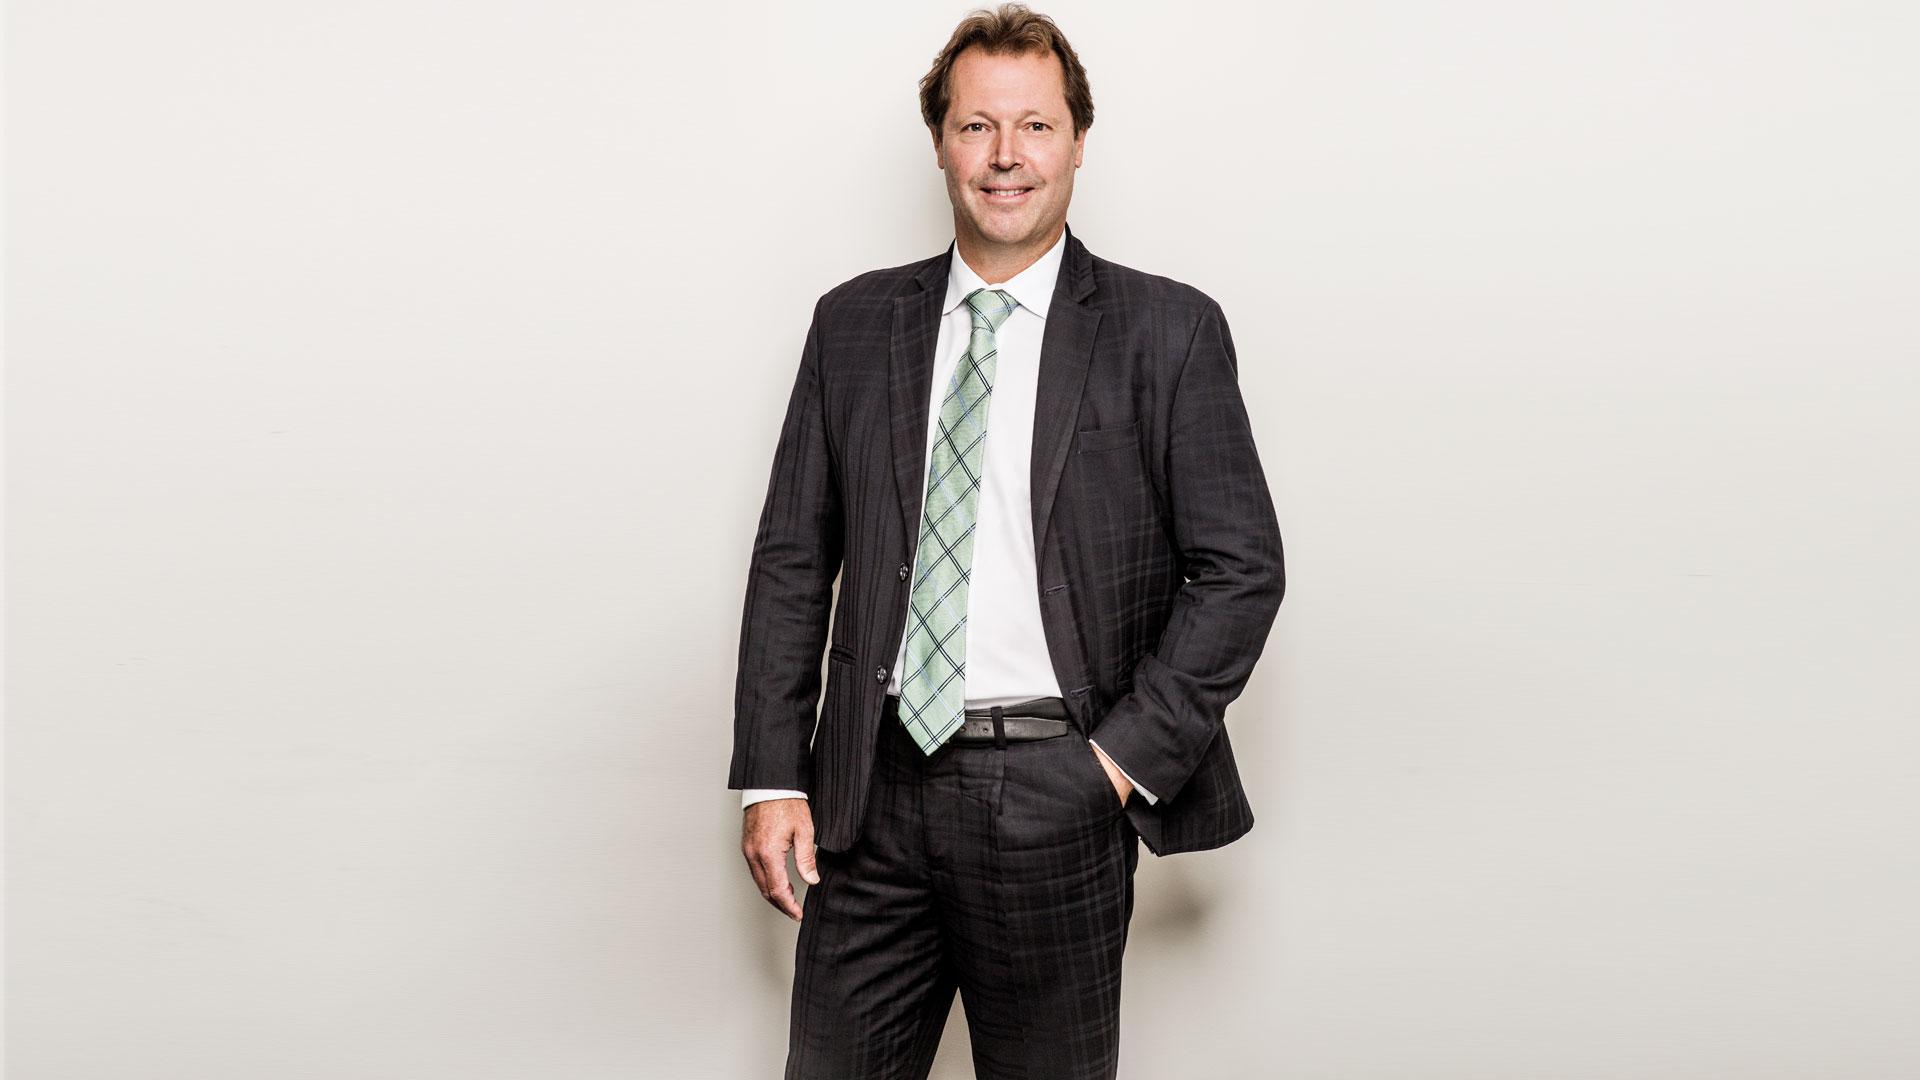 Andrew-Schnauer